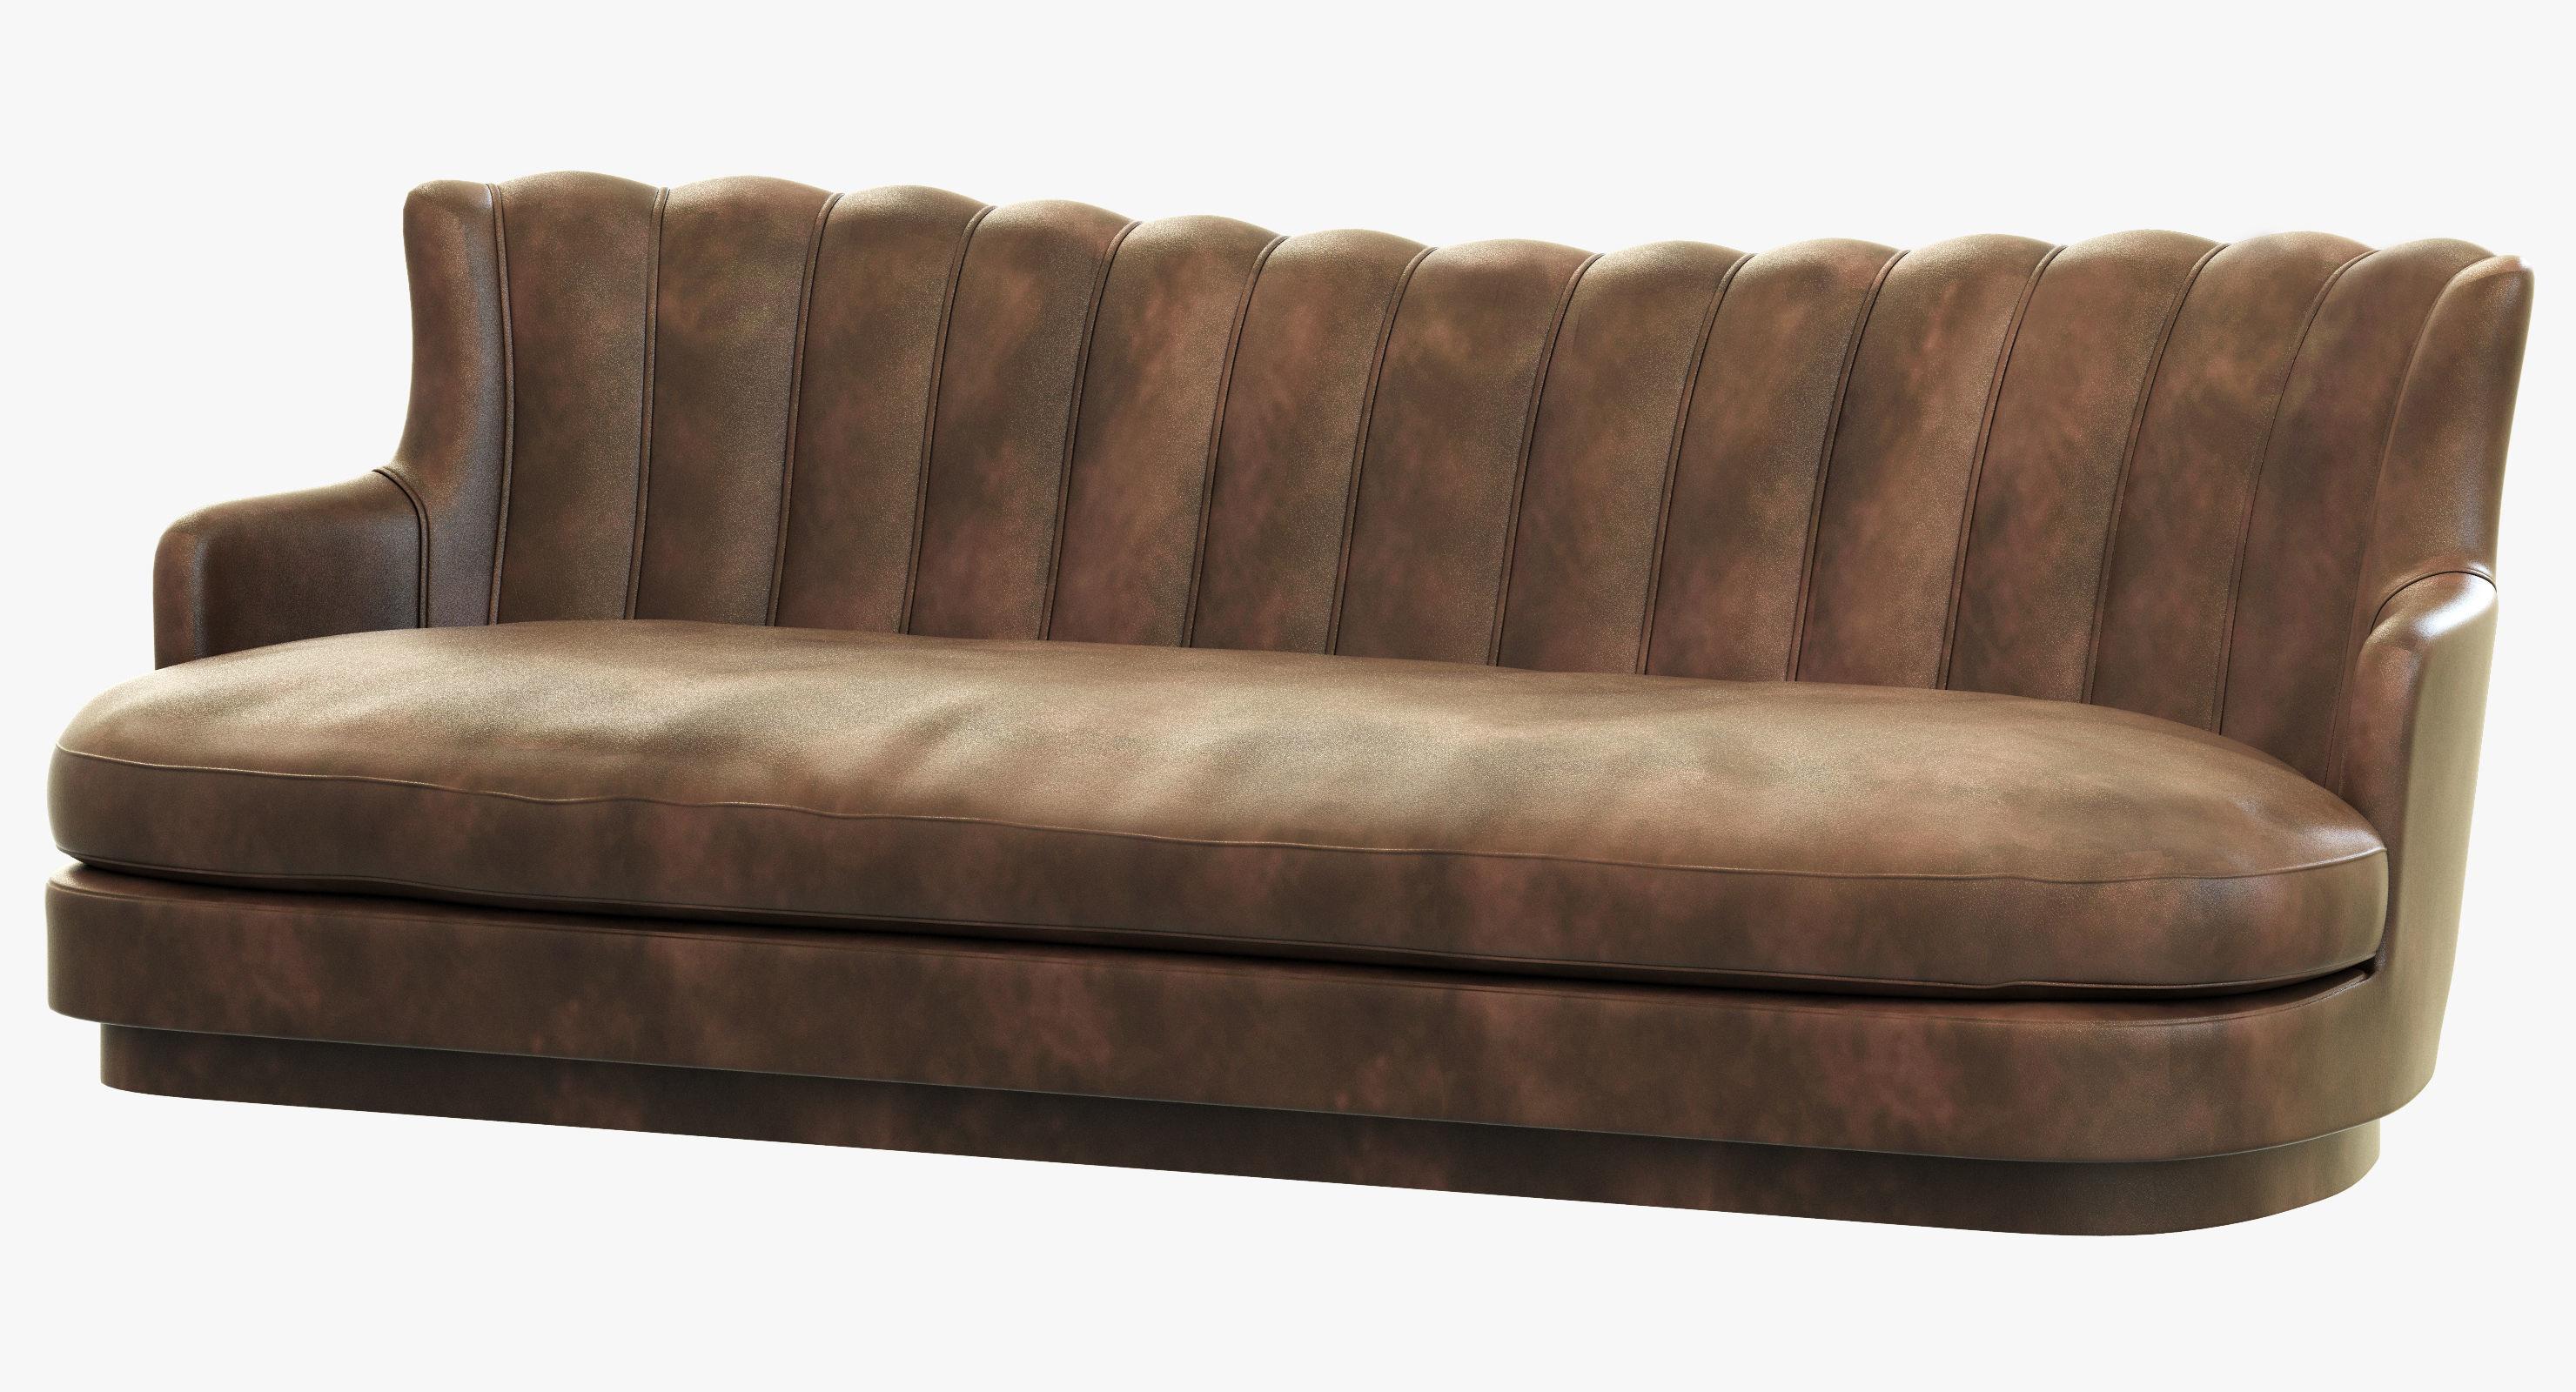 sofa set models in india colors combinations 2017 plum royaloak 3 1 by online living